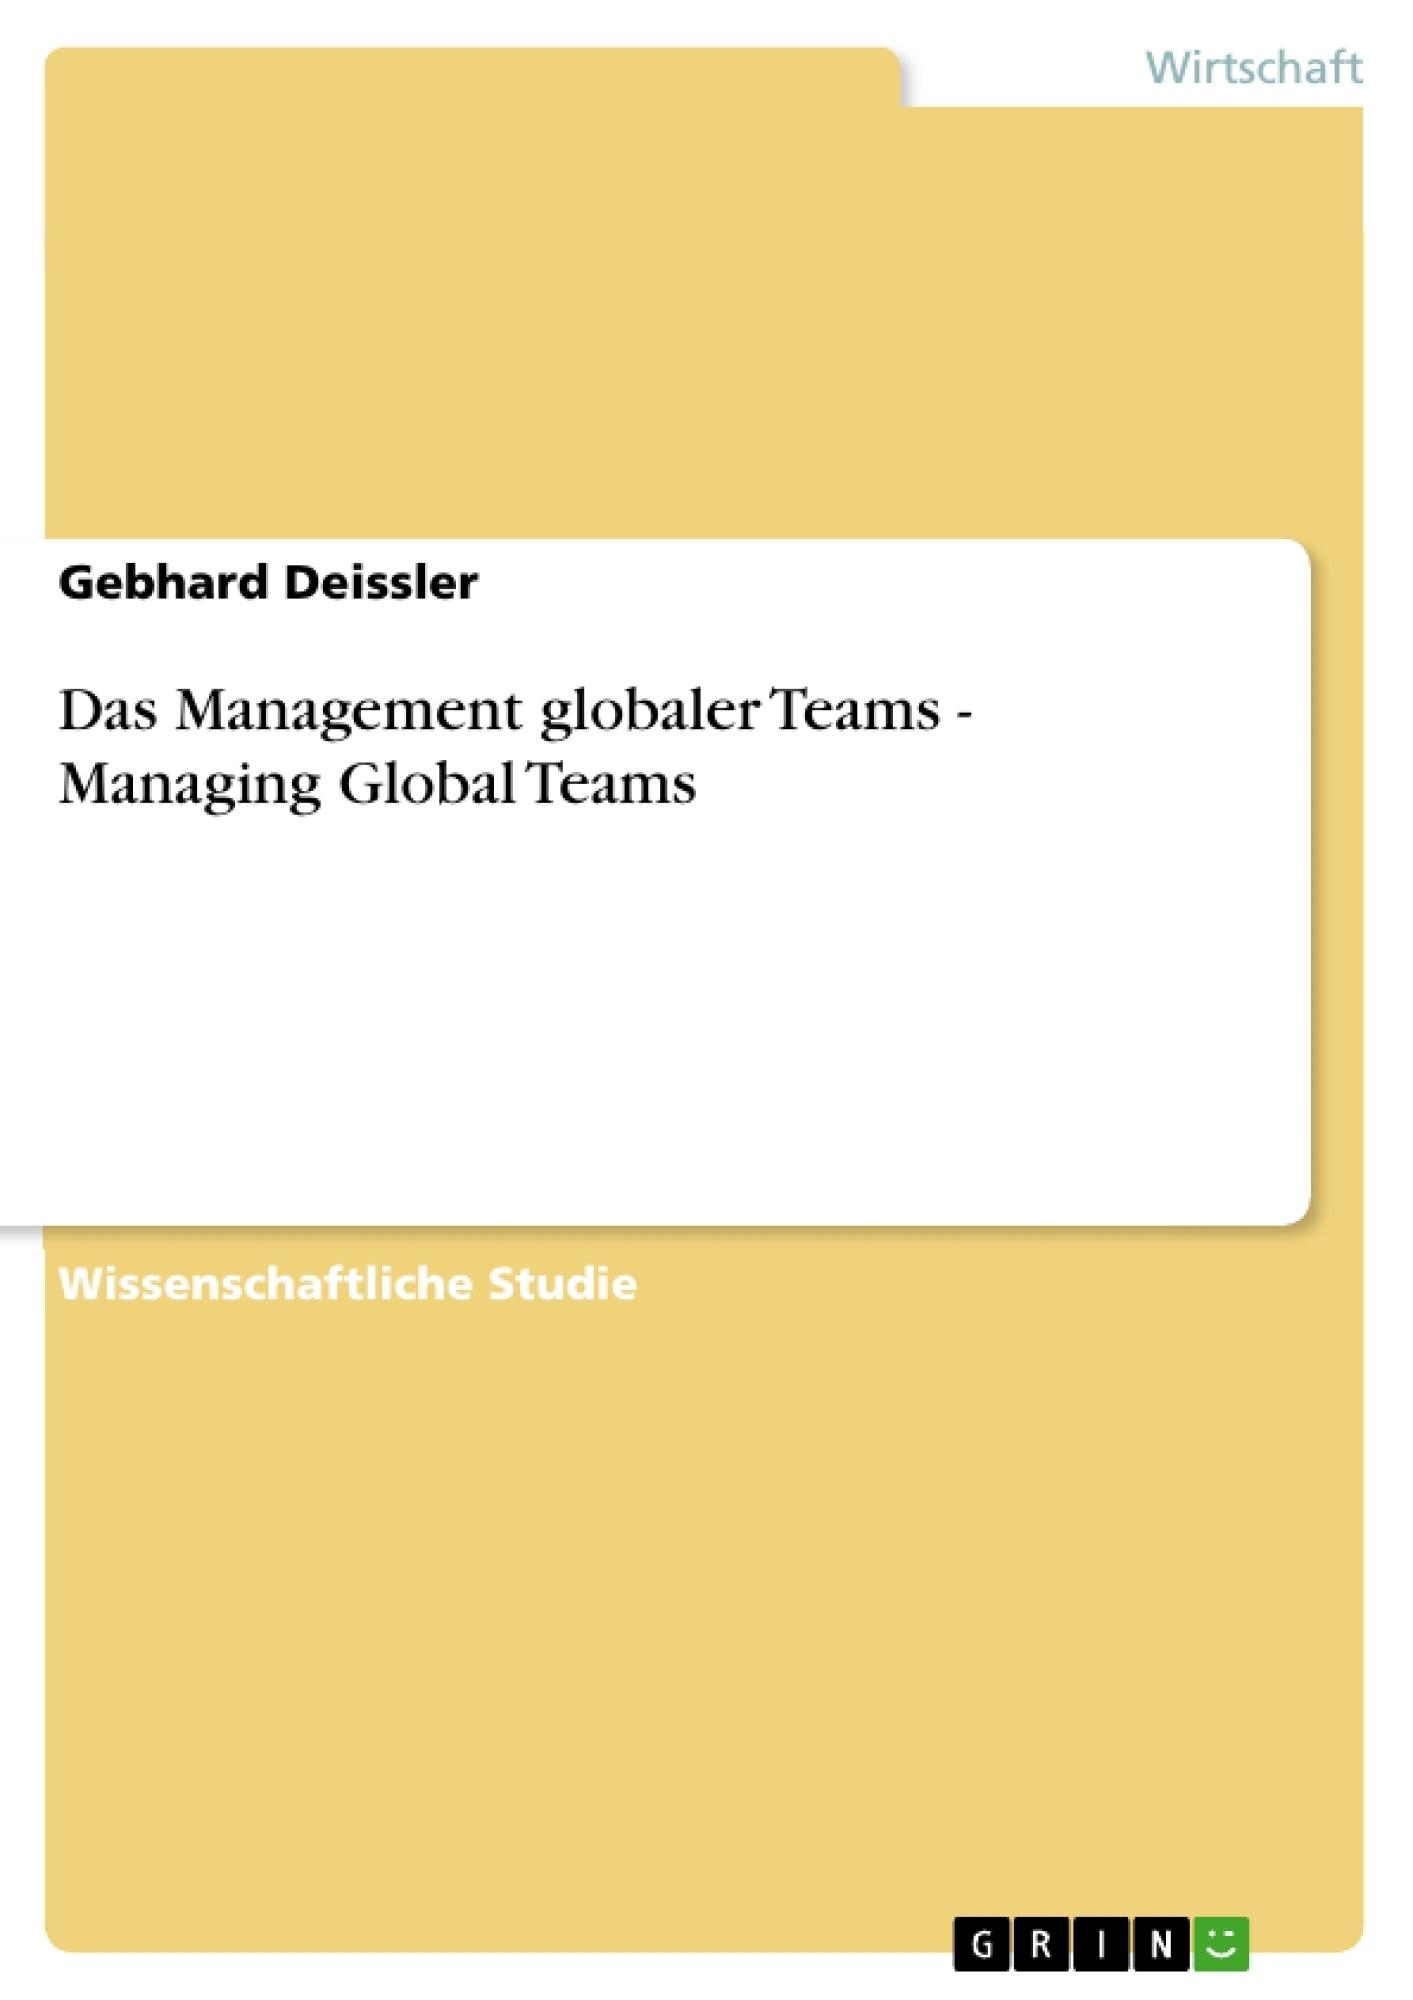 Titel: Das Management globaler Teams - Managing Global Teams